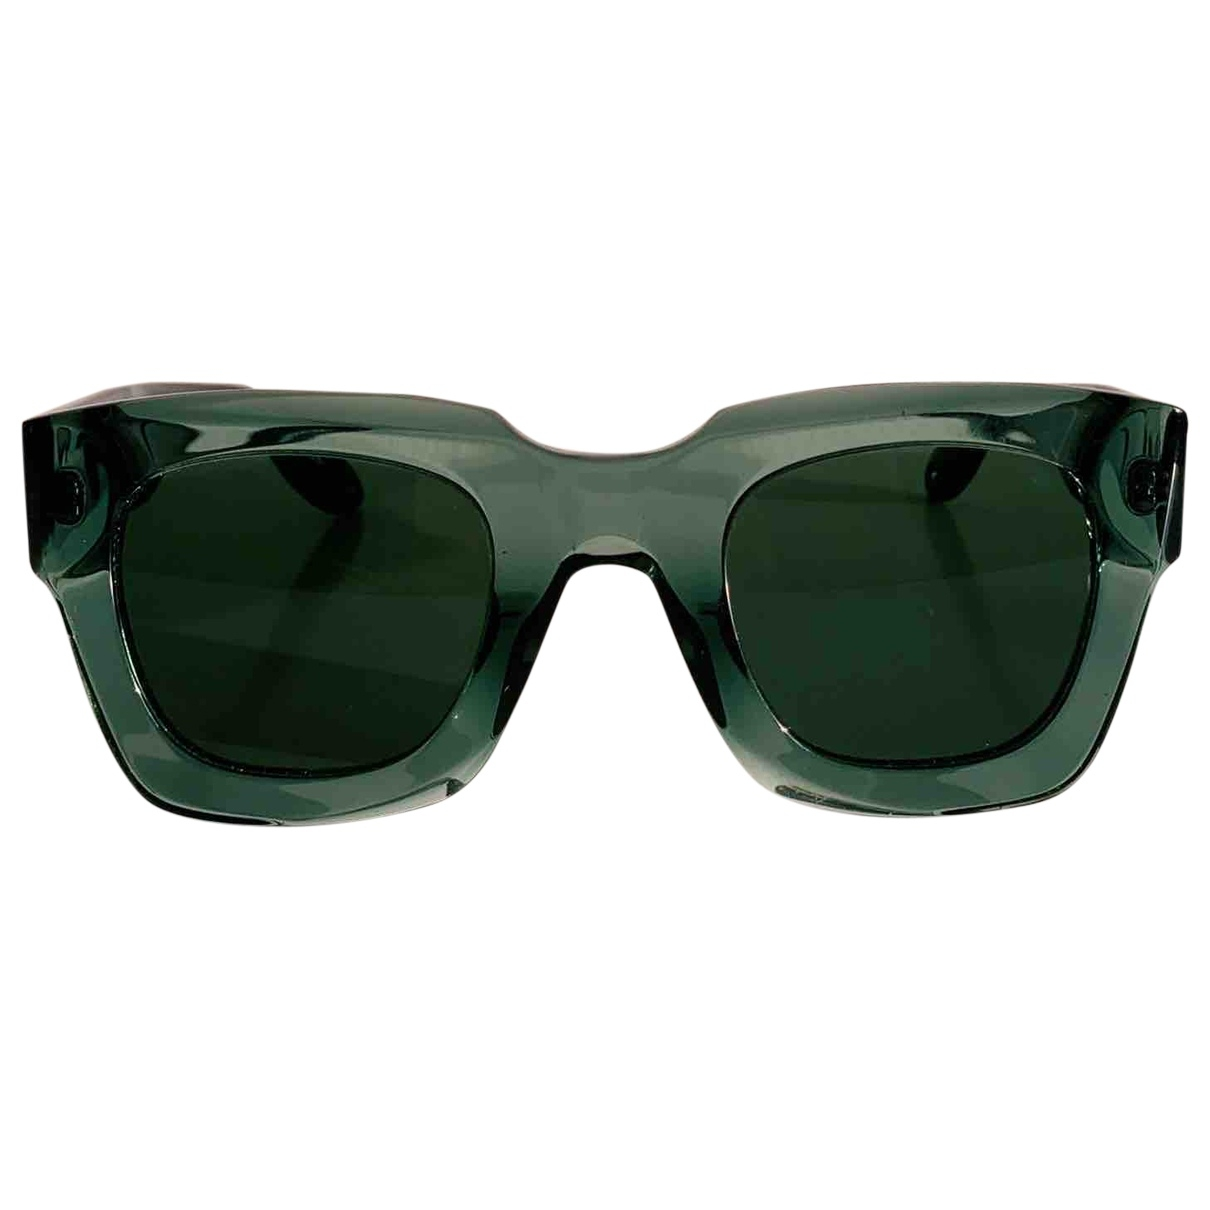 Givenchy - Lunettes   pour homme - vert